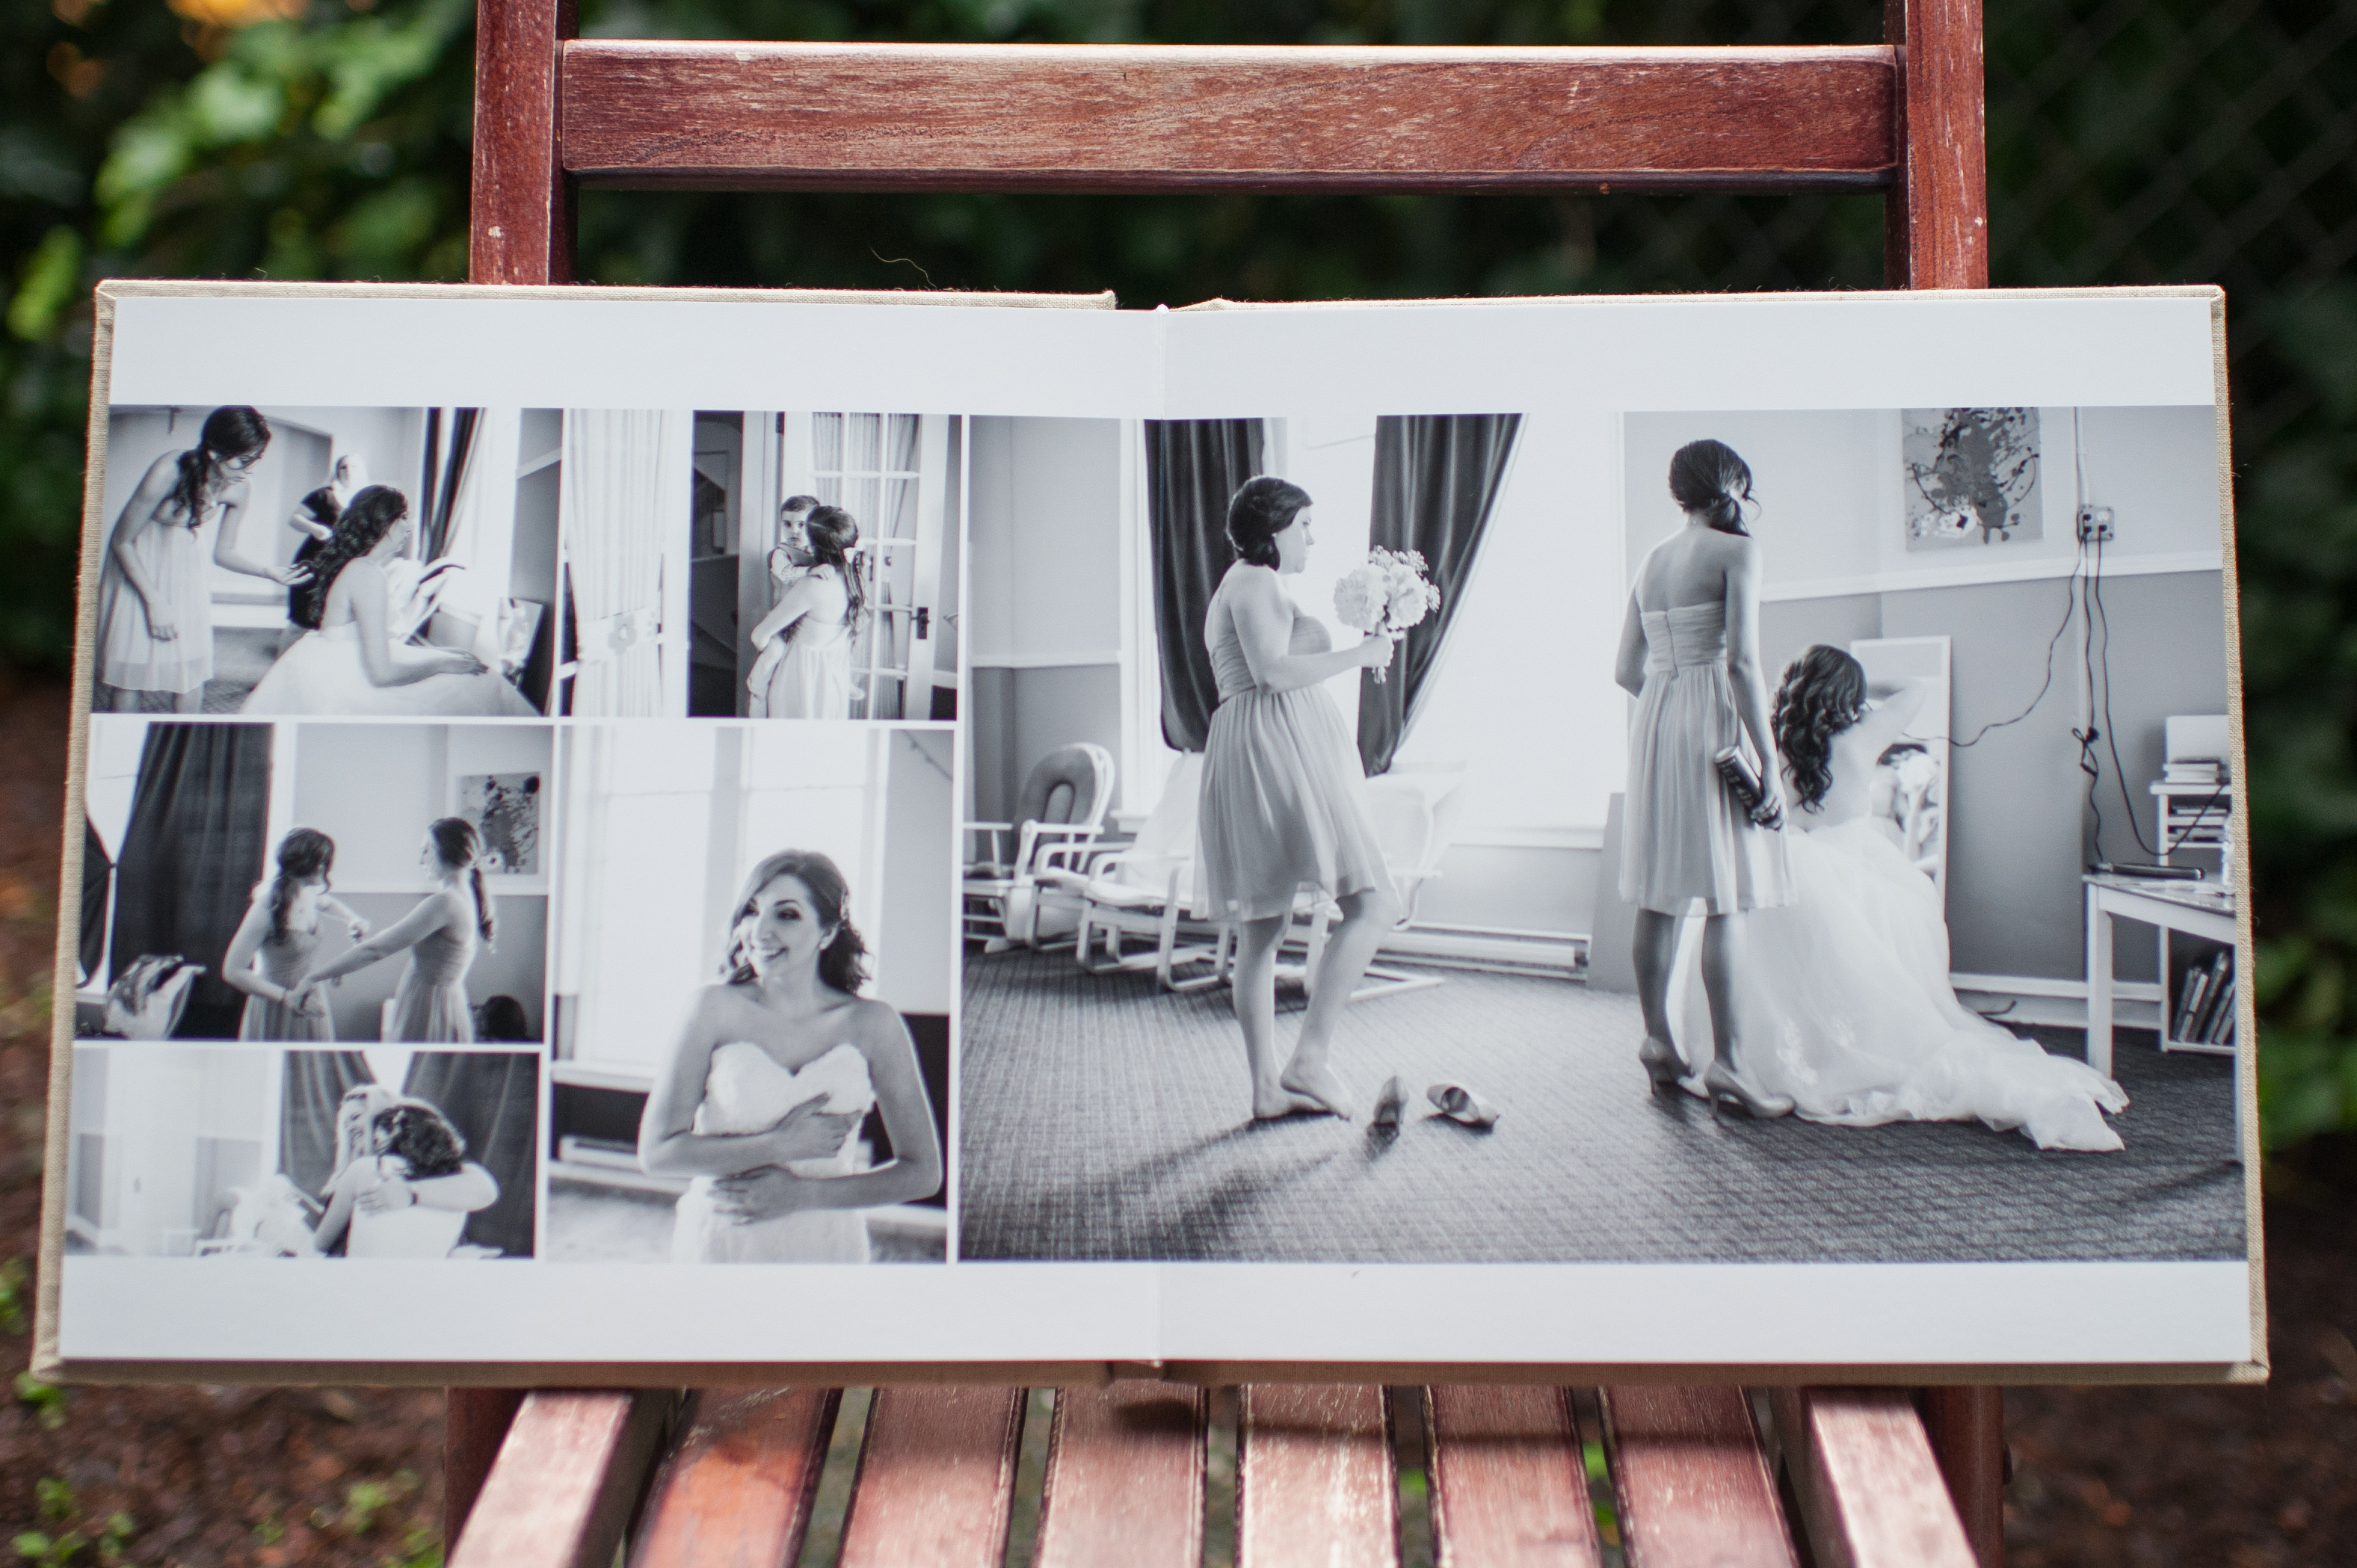 Wedding Photo Albums Wedding albums and design: galleryhip.com/wedding-photo-albums.html